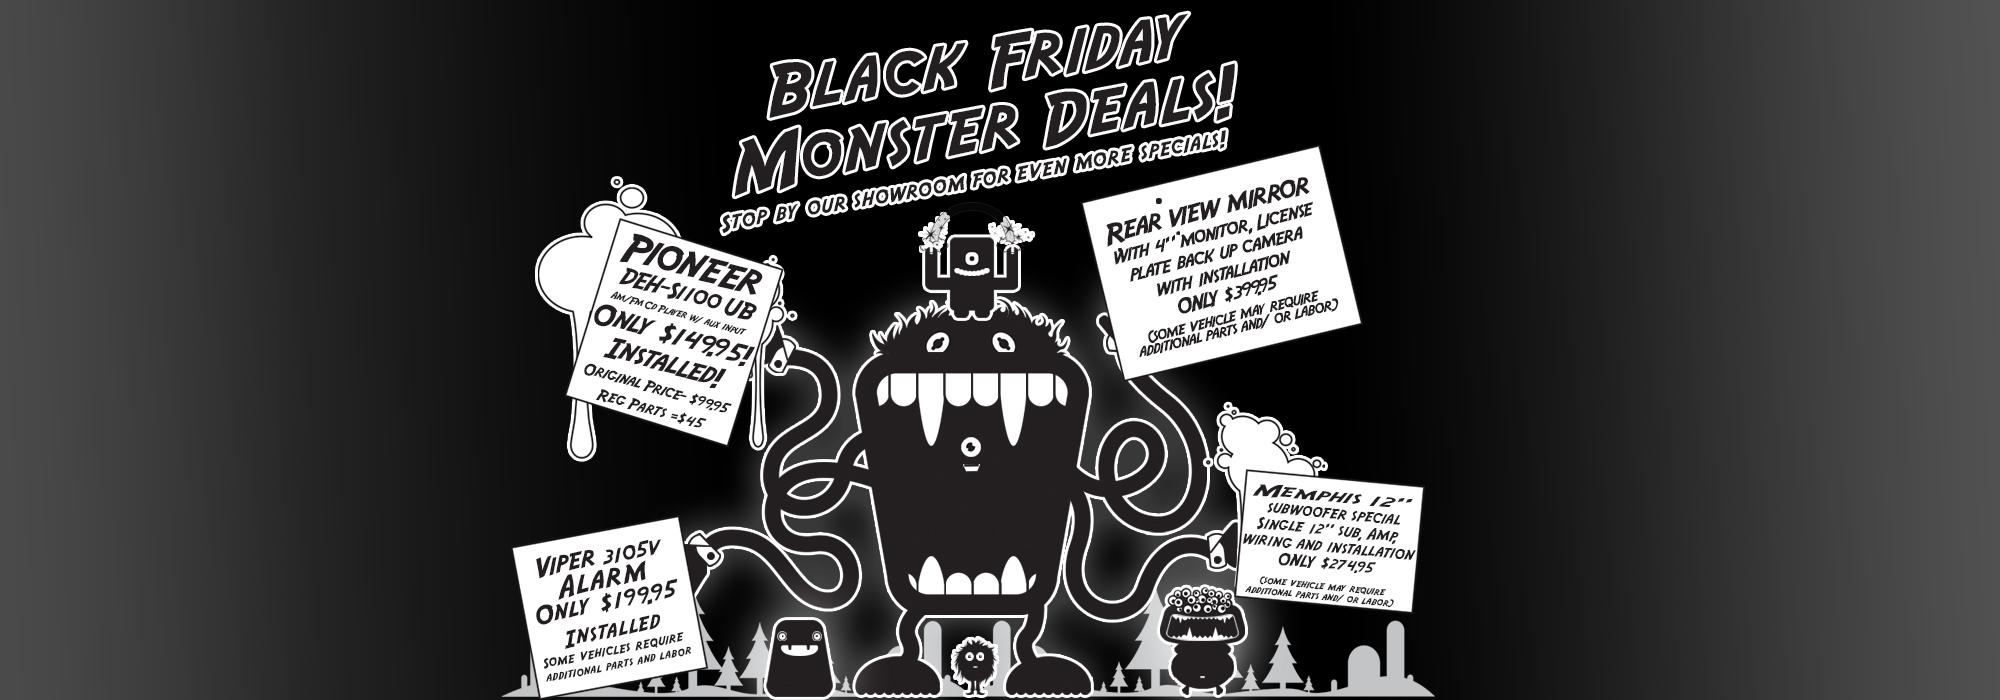 Black Friday Monster Deals